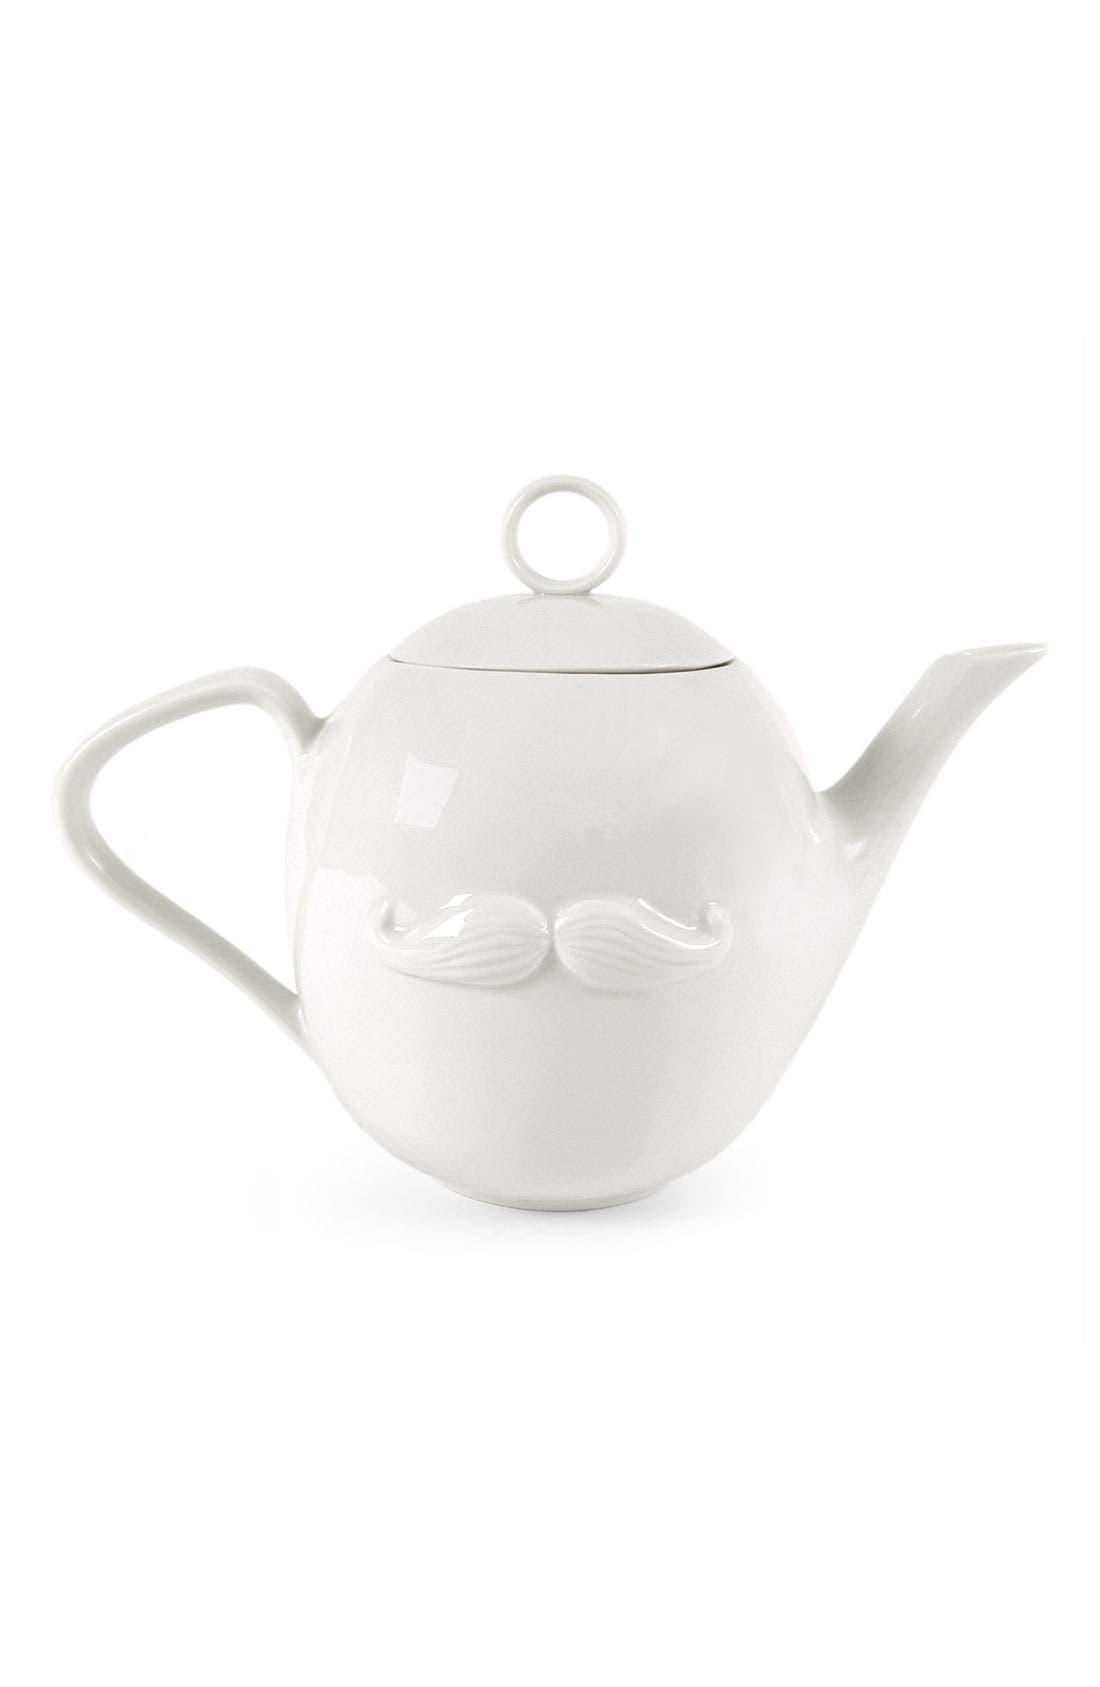 Main Image - Jonathan Adler 'Muse' Porcelain Teapot